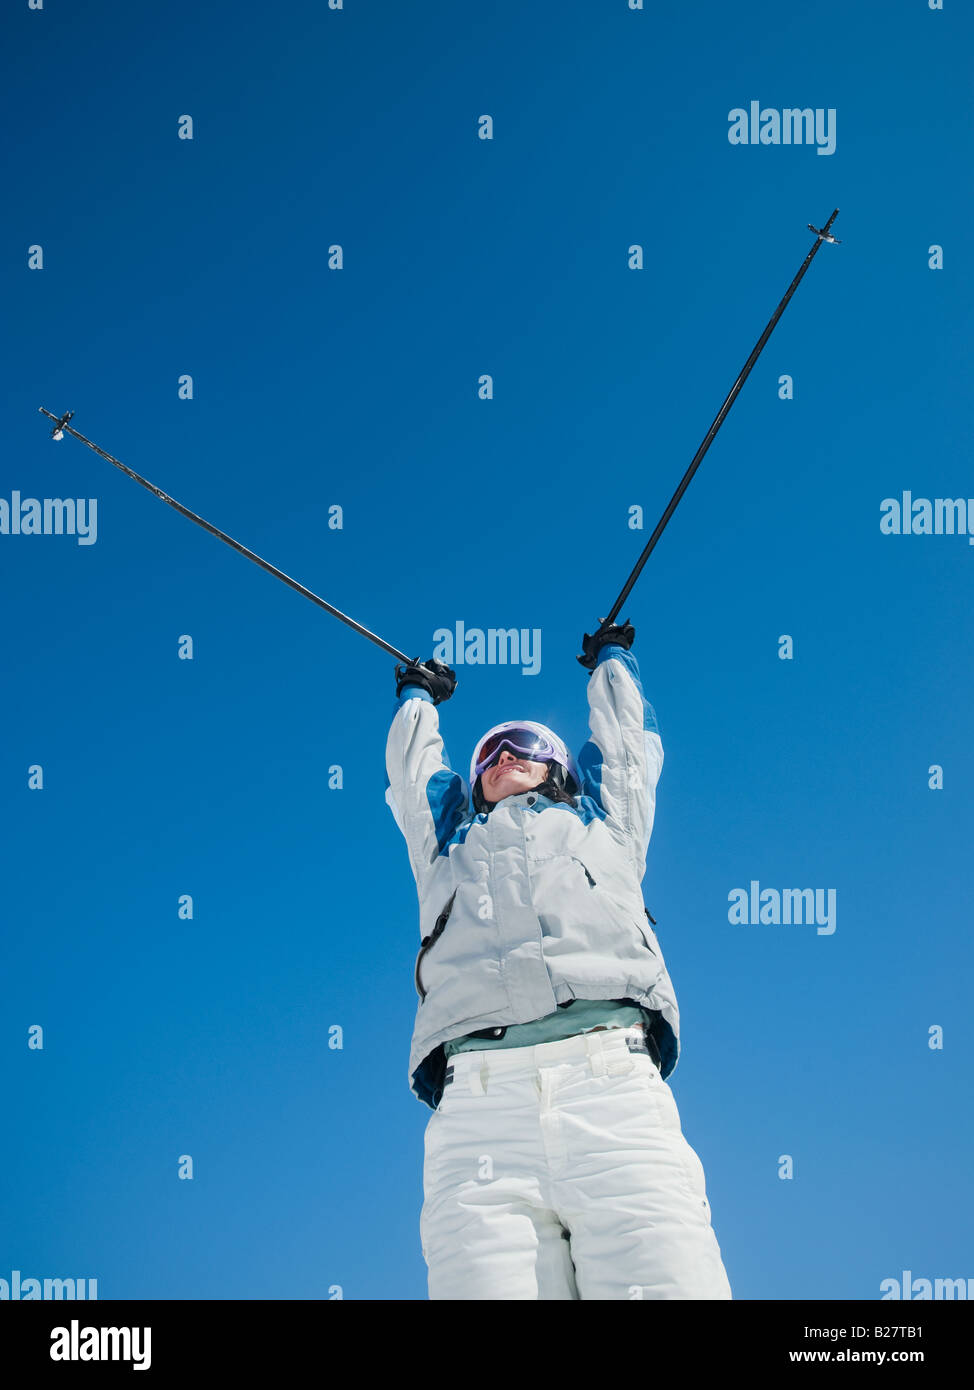 Woman holding ski poles over head - Stock Image